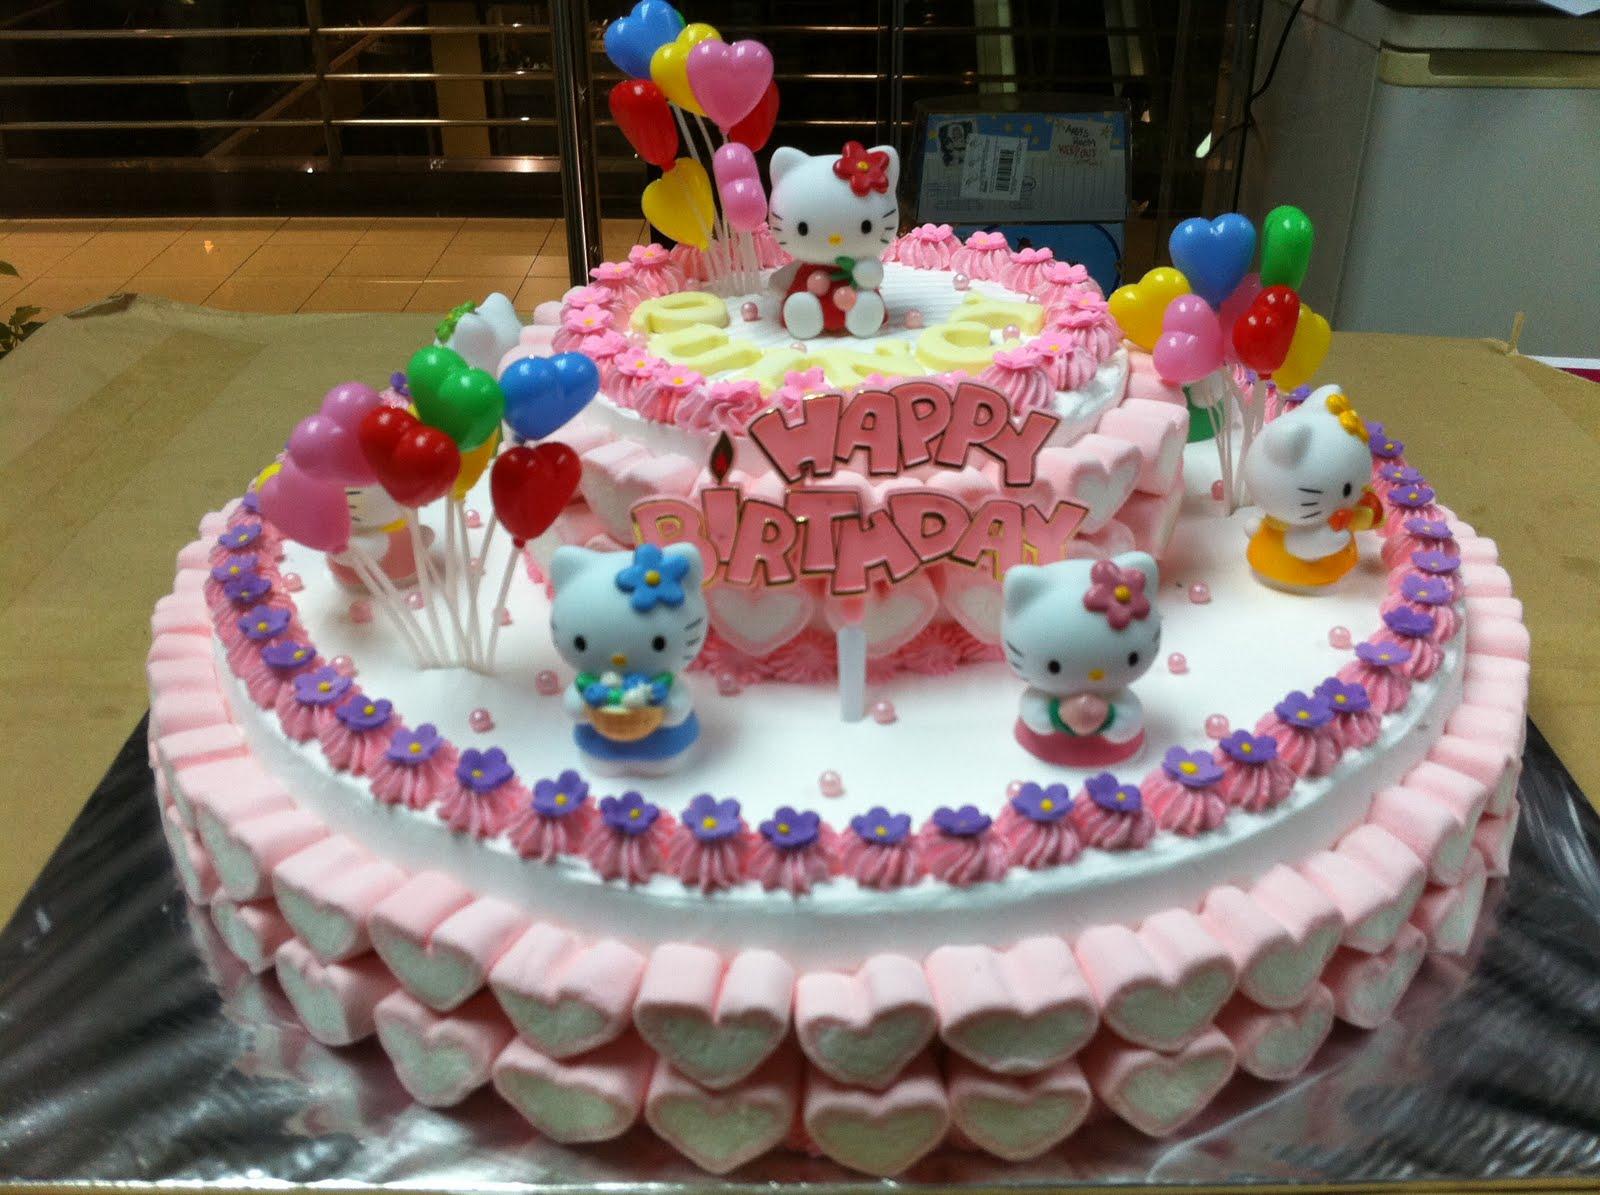 Phenomenal 6 10 Birthday Cakes At Shoprite Photo Shoprite Birthday Cake Personalised Birthday Cards Veneteletsinfo